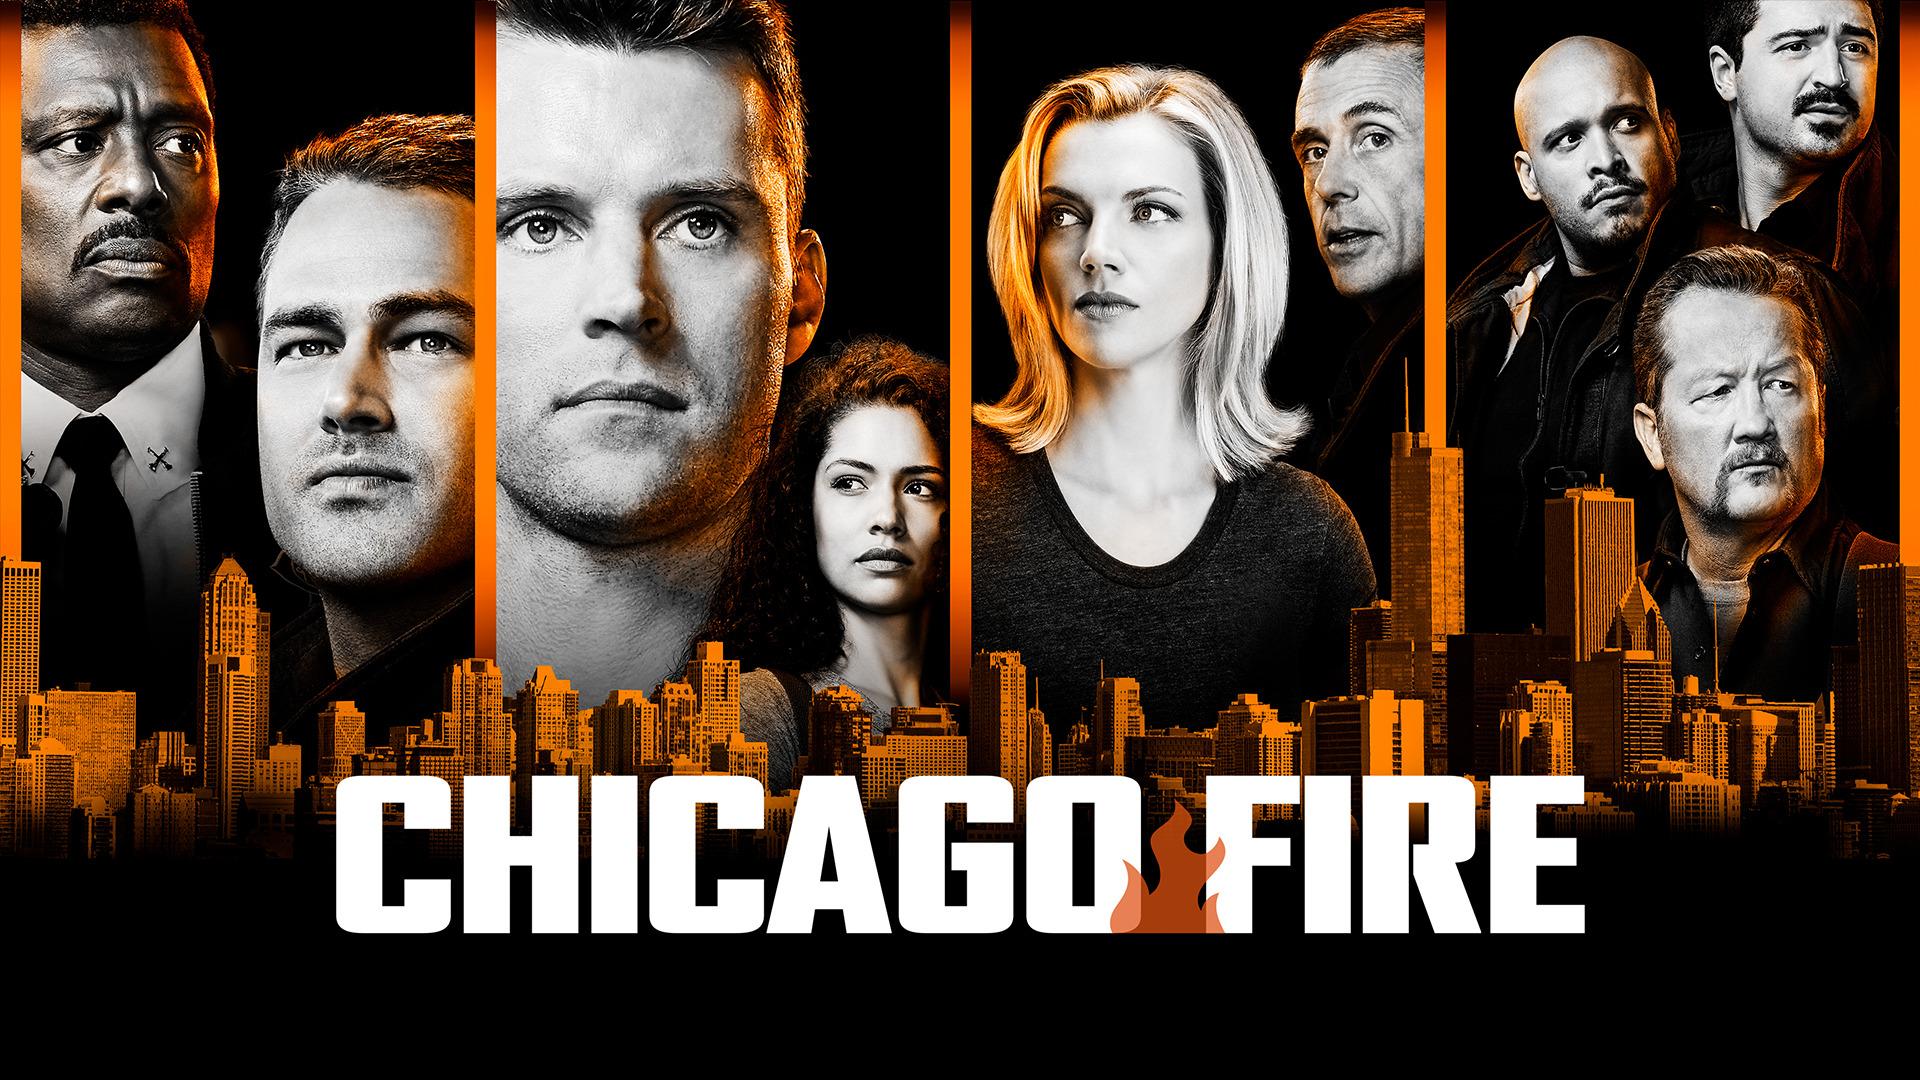 Show Chicago Fire